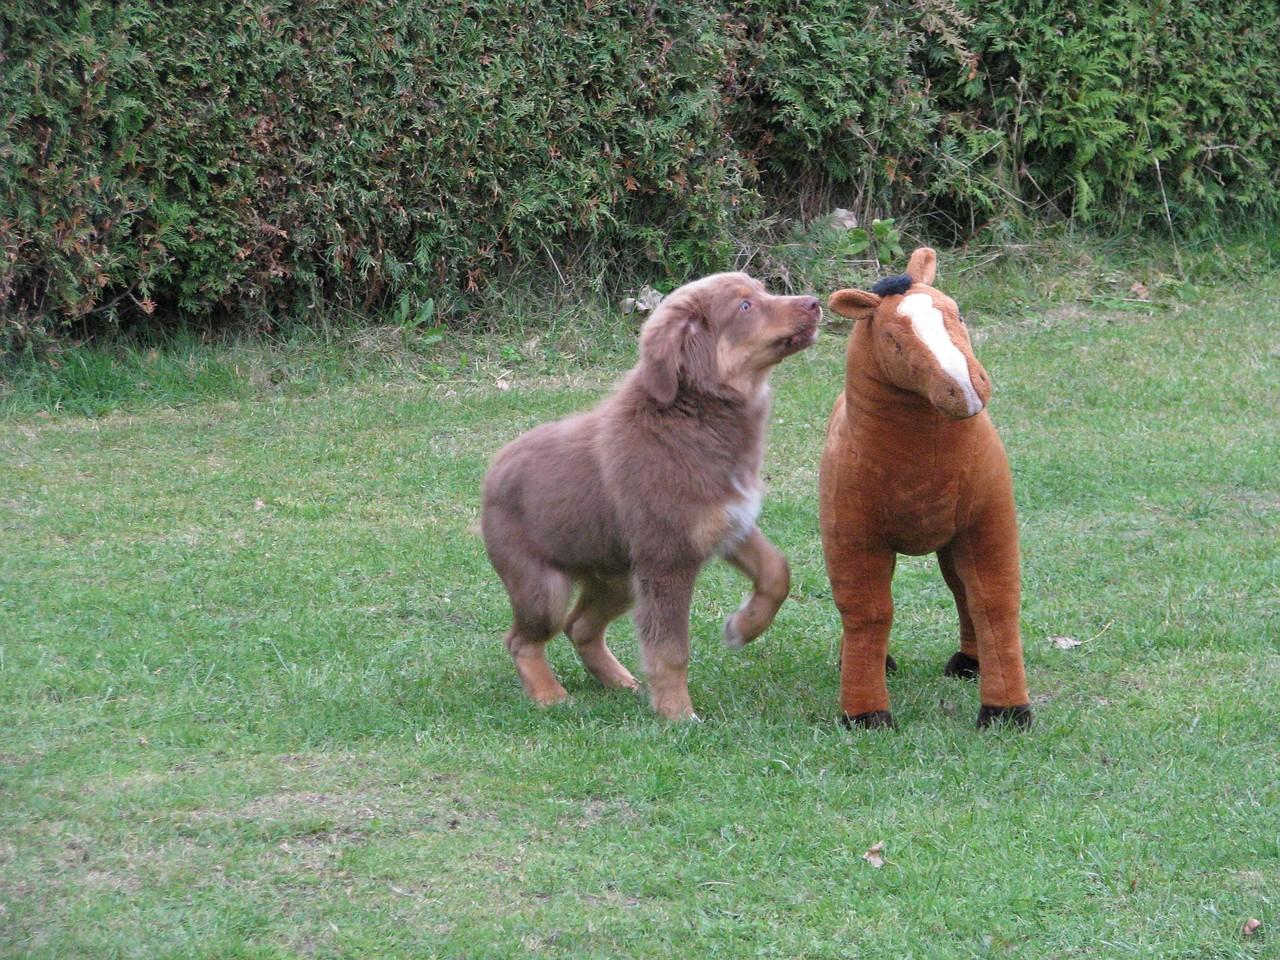 Teddy muss nun doch mal schnuppern